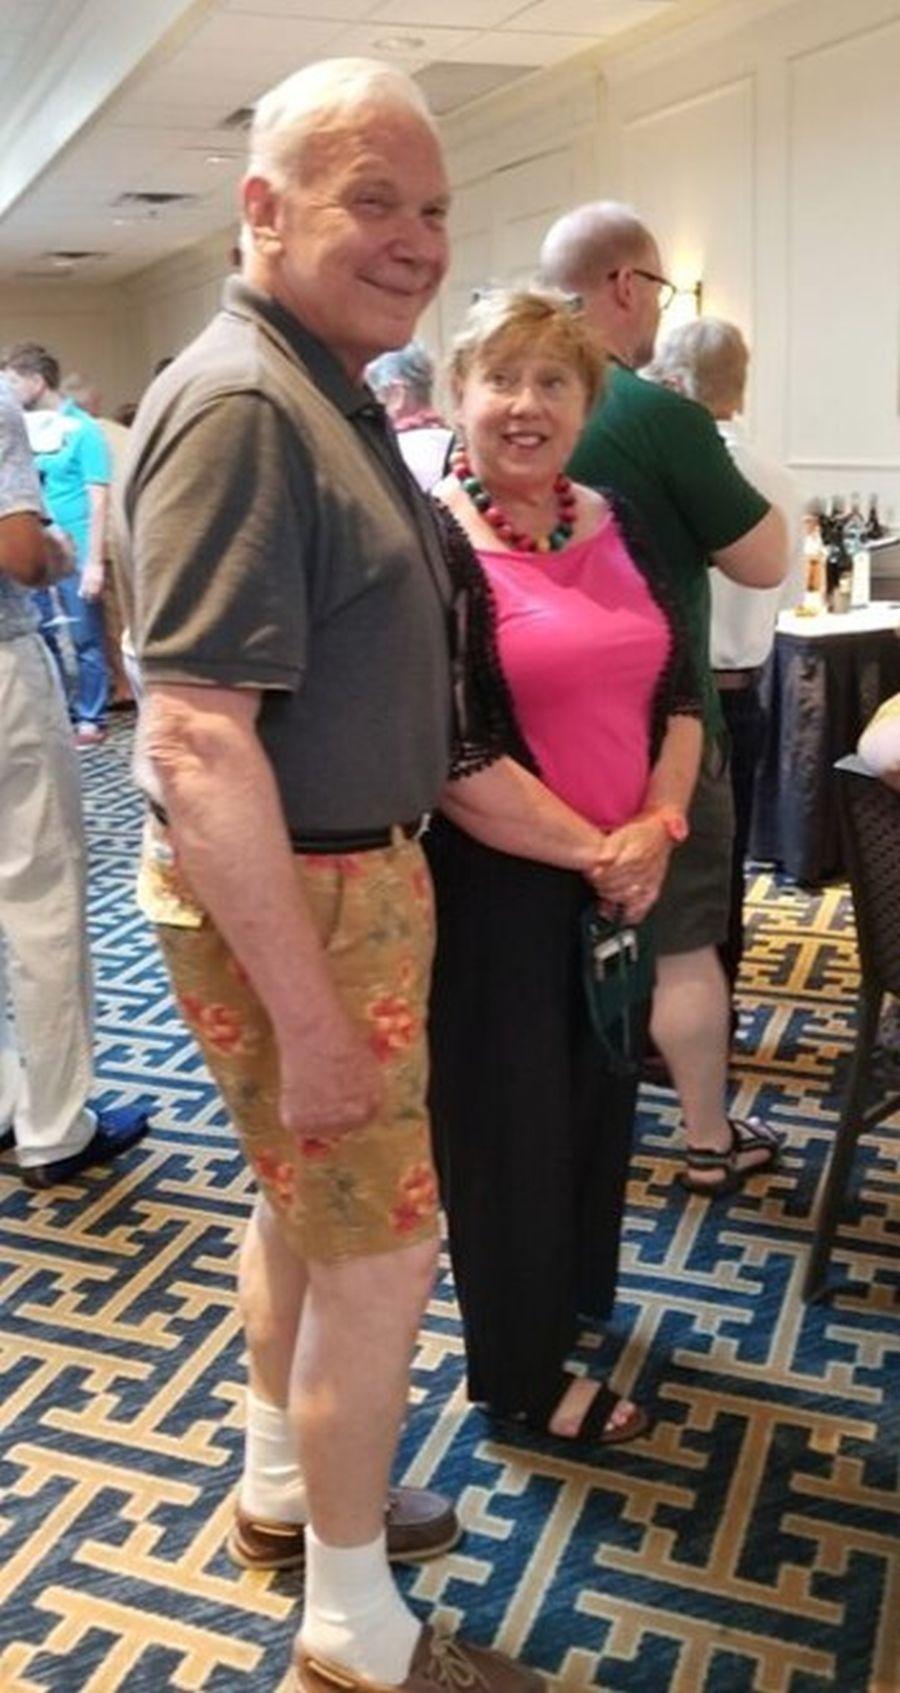 Michael Riley and Betsy Szymczak